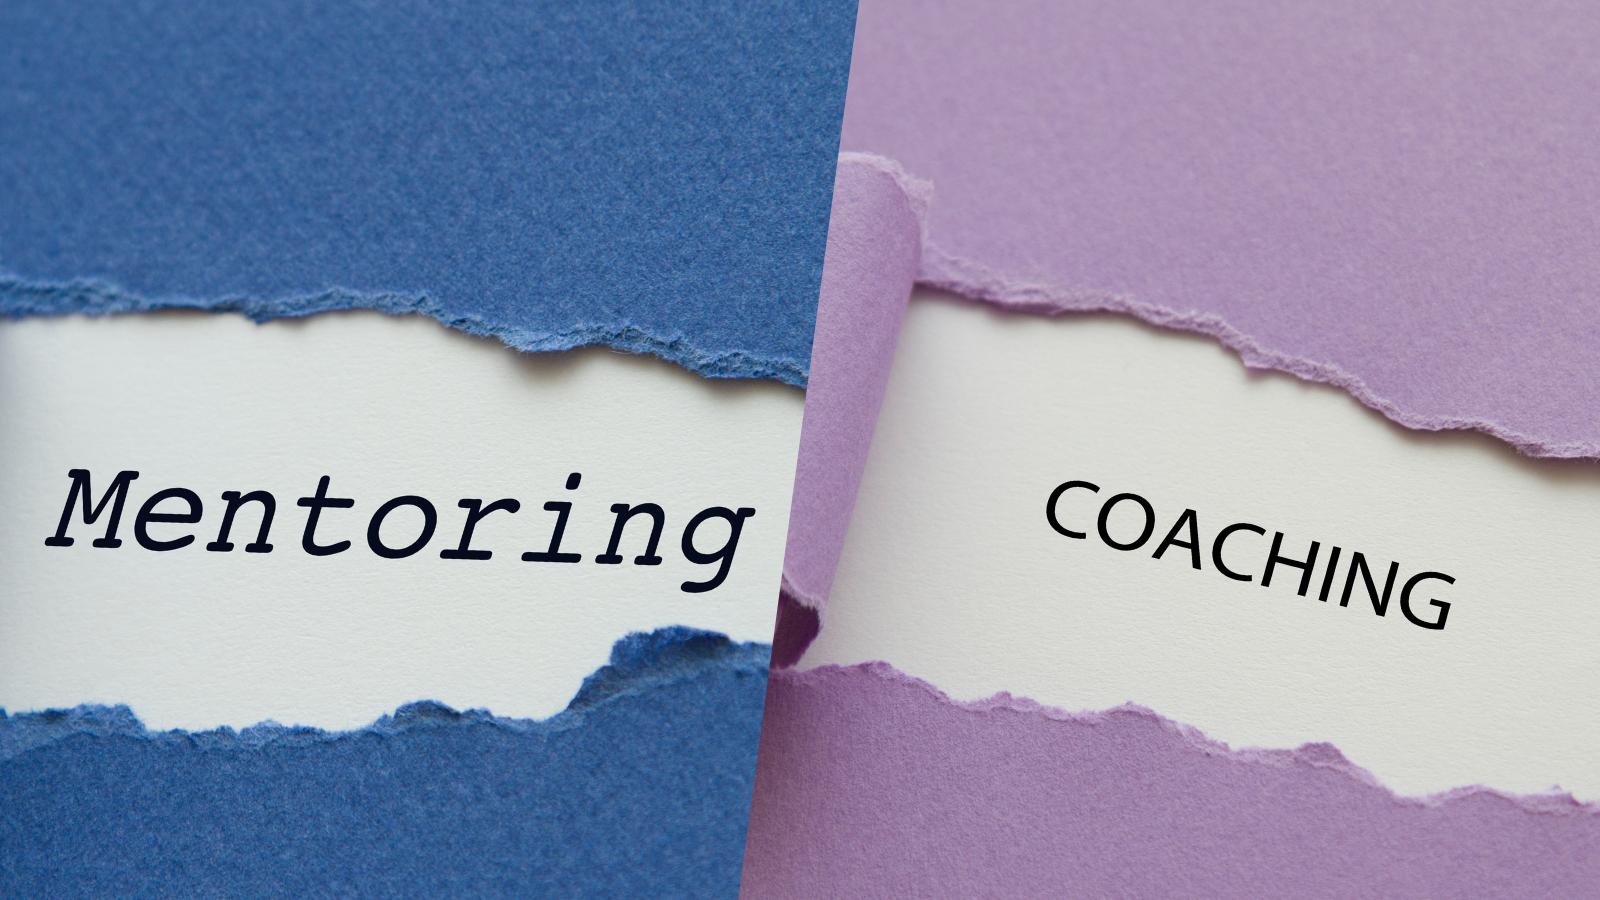 Mentoring vs Coaching